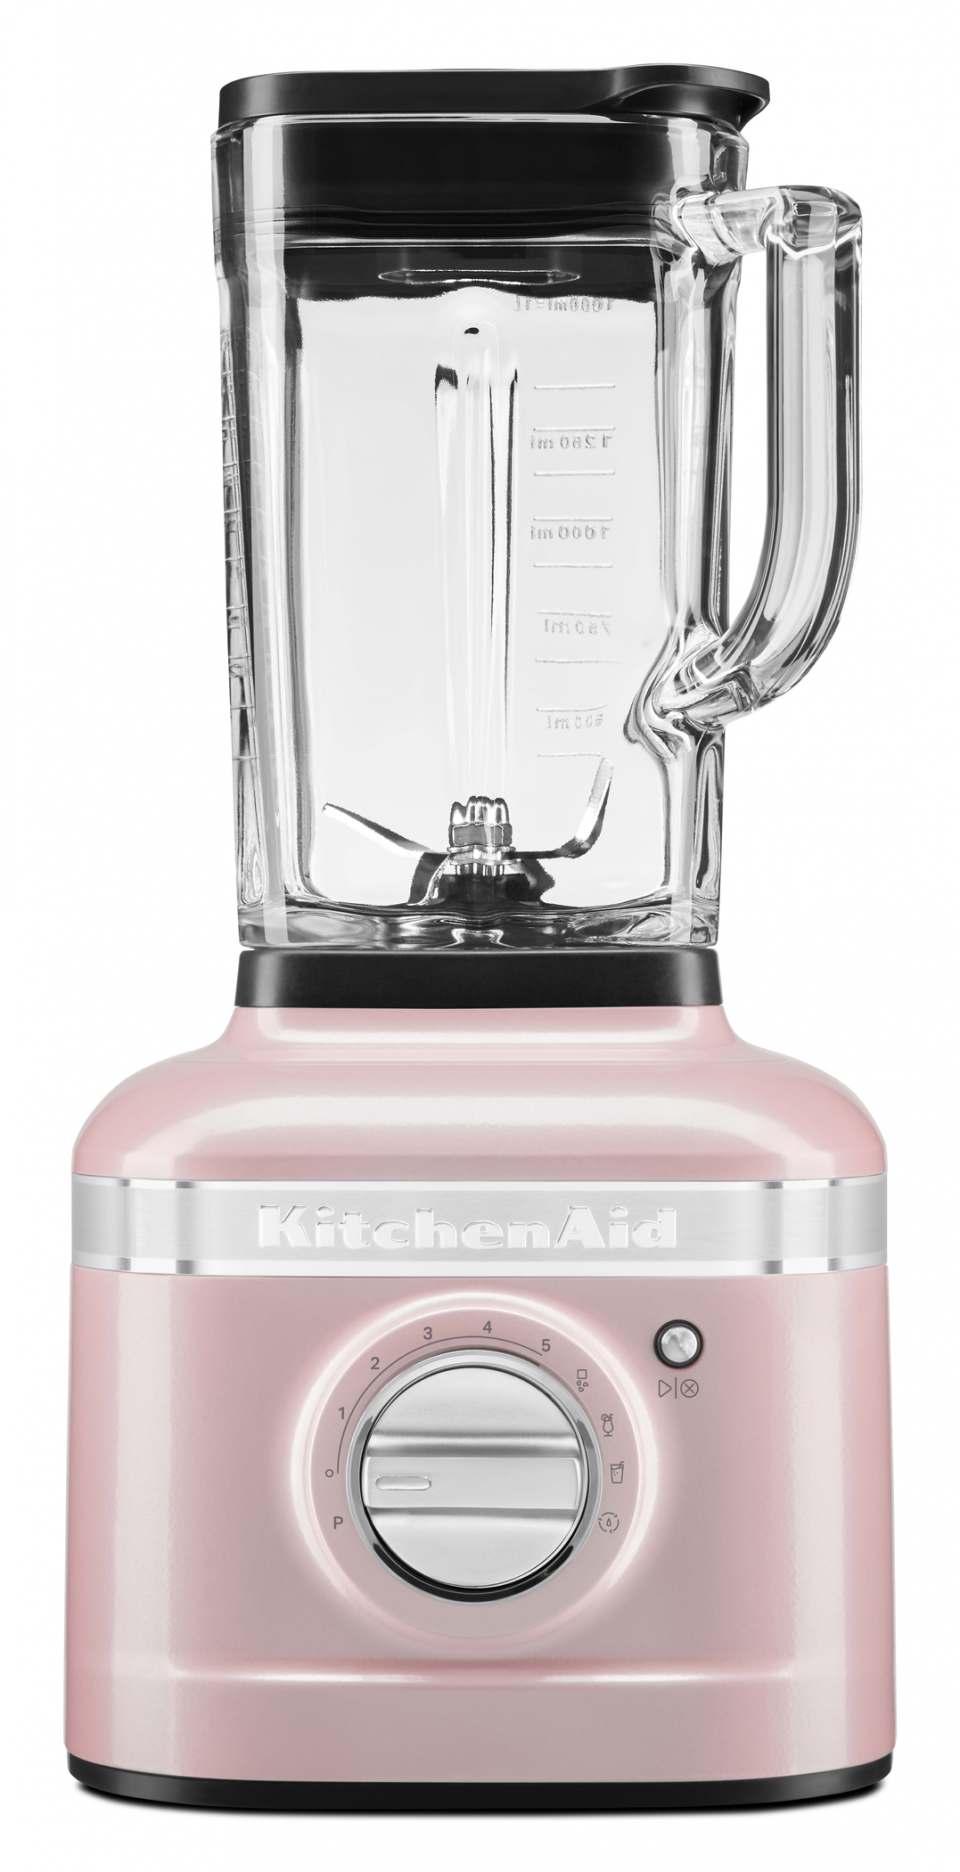 KitchenAid Standmixer Artisan K400 mit 1,5 PS Motor.